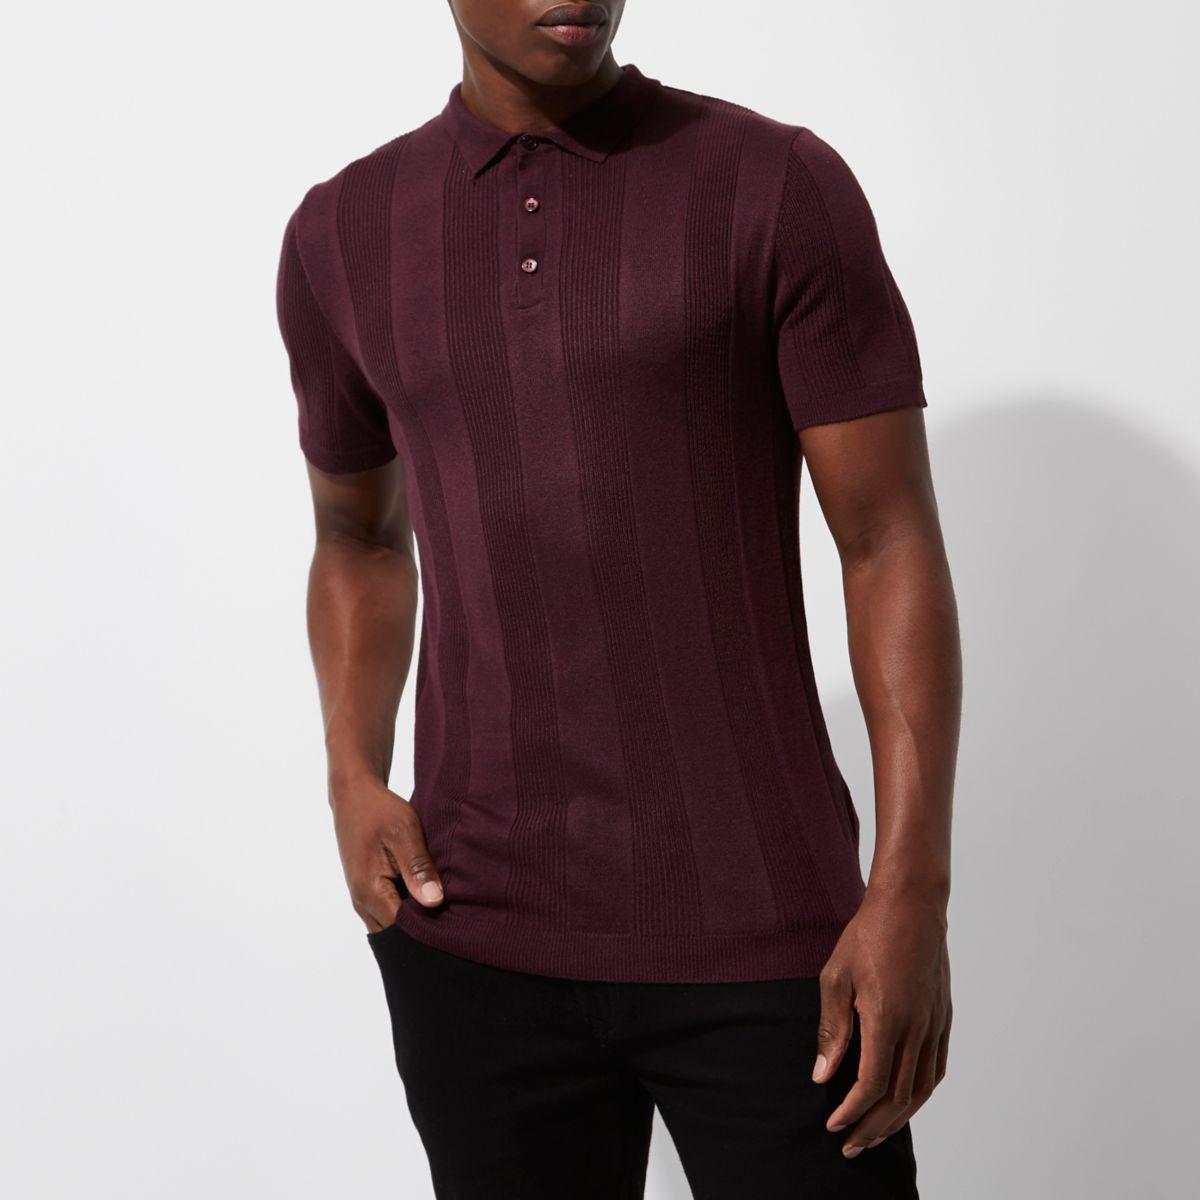 Burgundy Rib Short Sleeve Muscle Polo Shirt Polo Shirts: burgundy polo shirt boys